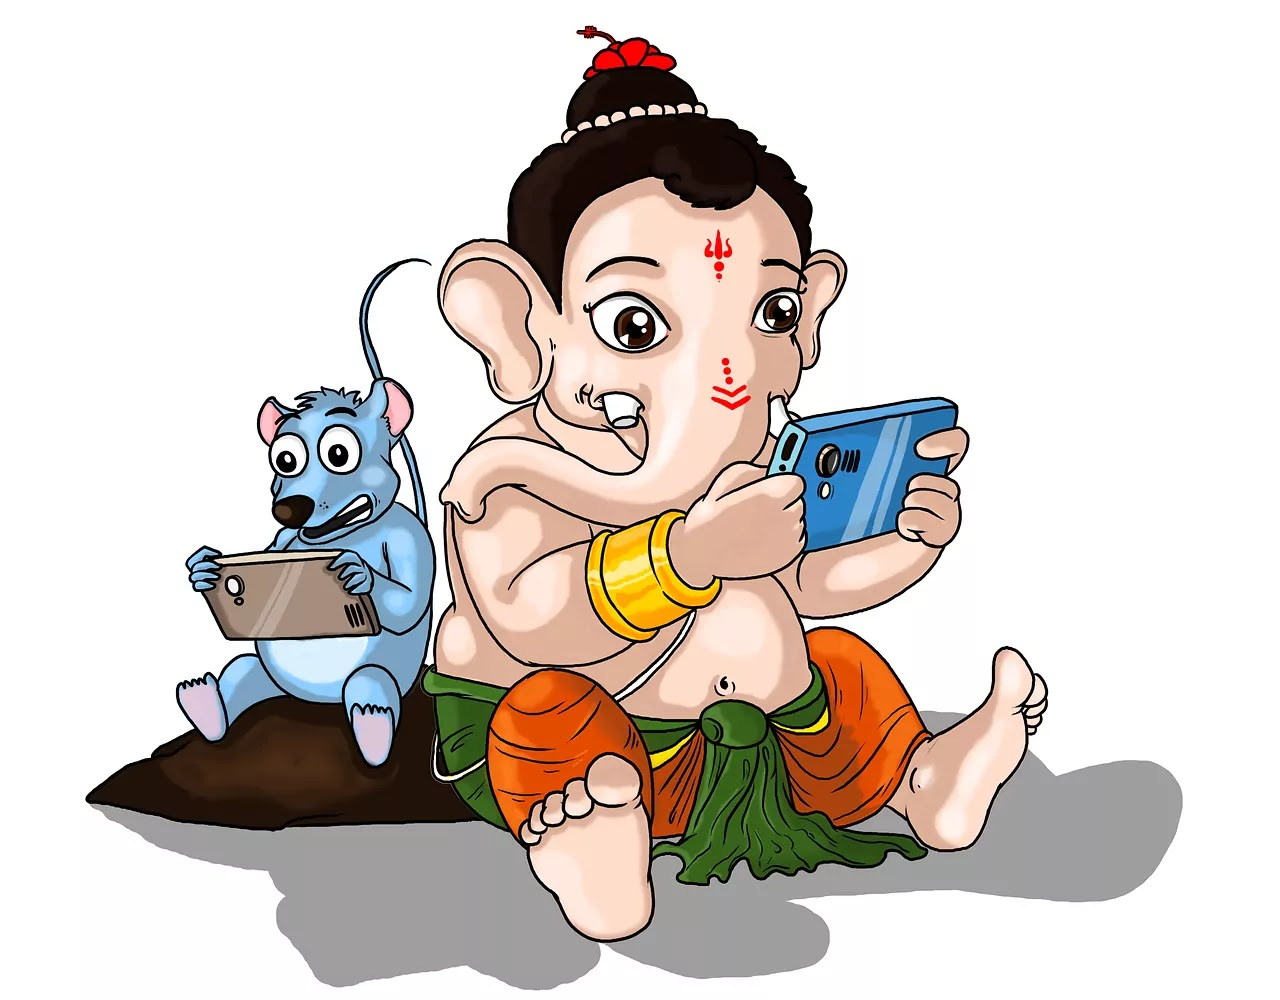 happy ganesh chaturthi message